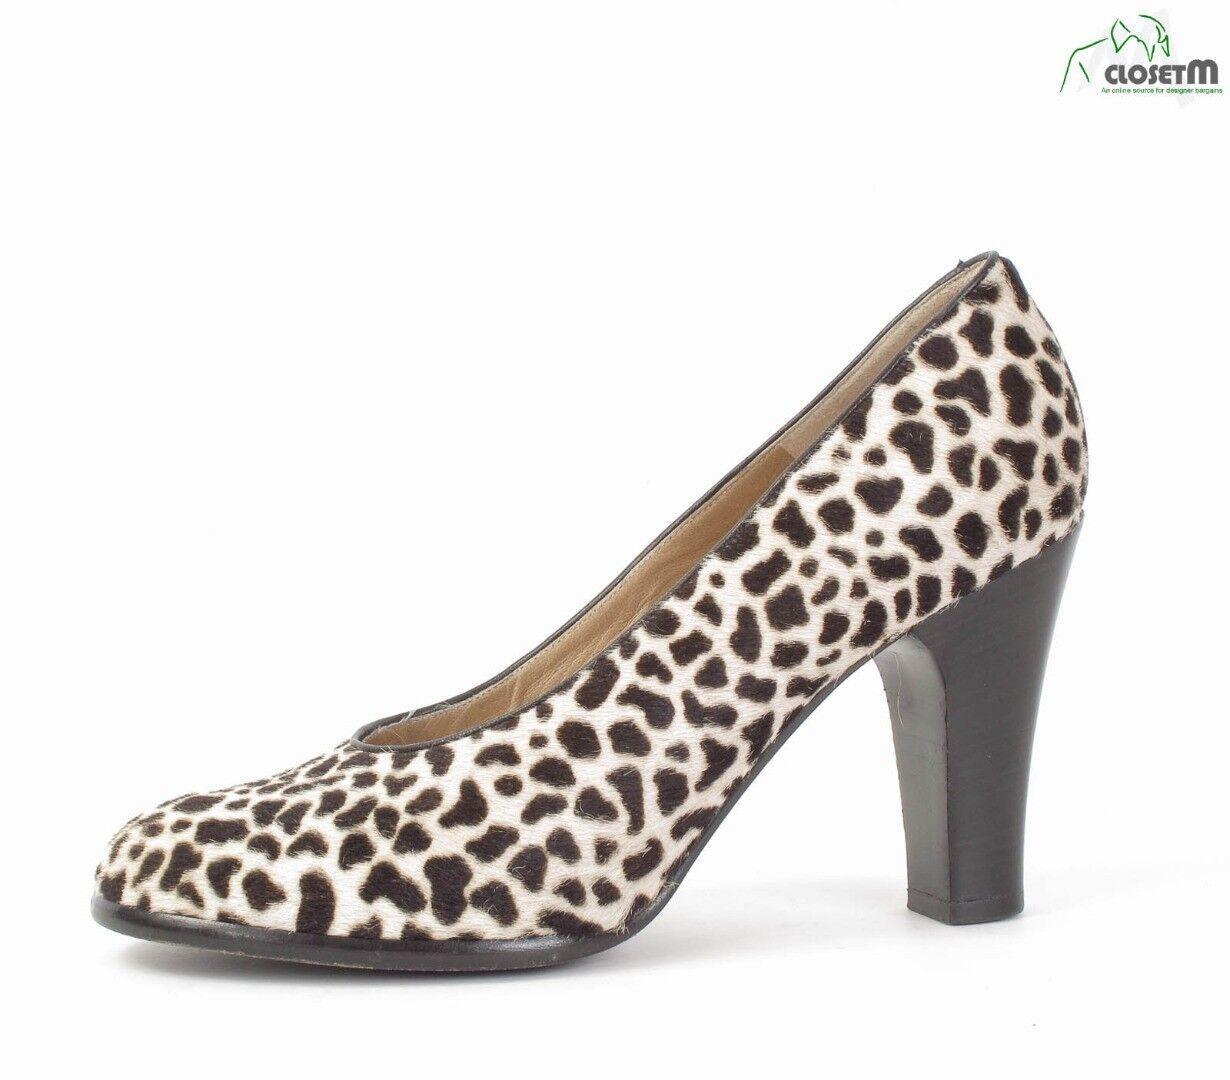 Varda Stenciled Pony Hair Heels shoes Sz. EU 36.5  US 6.5